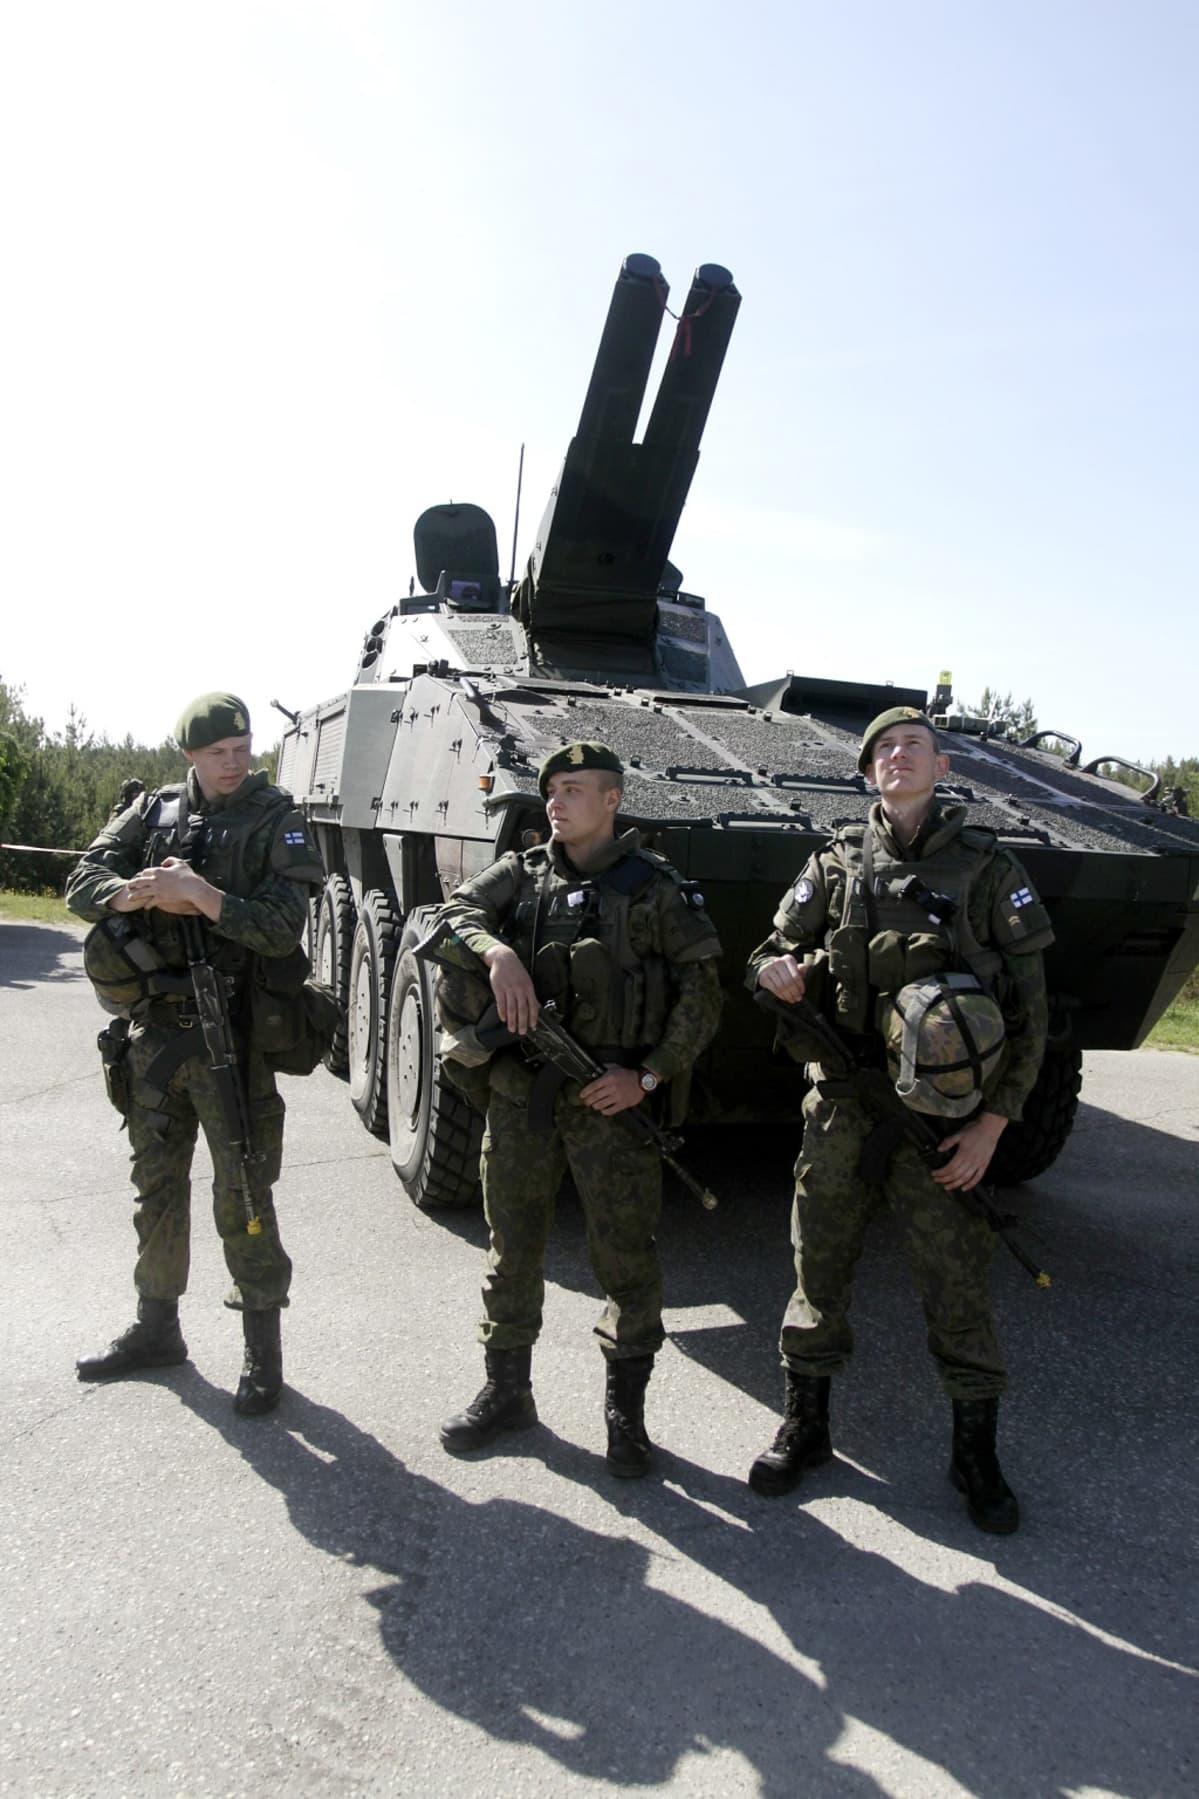 sotilaita ajoneuvon edessä